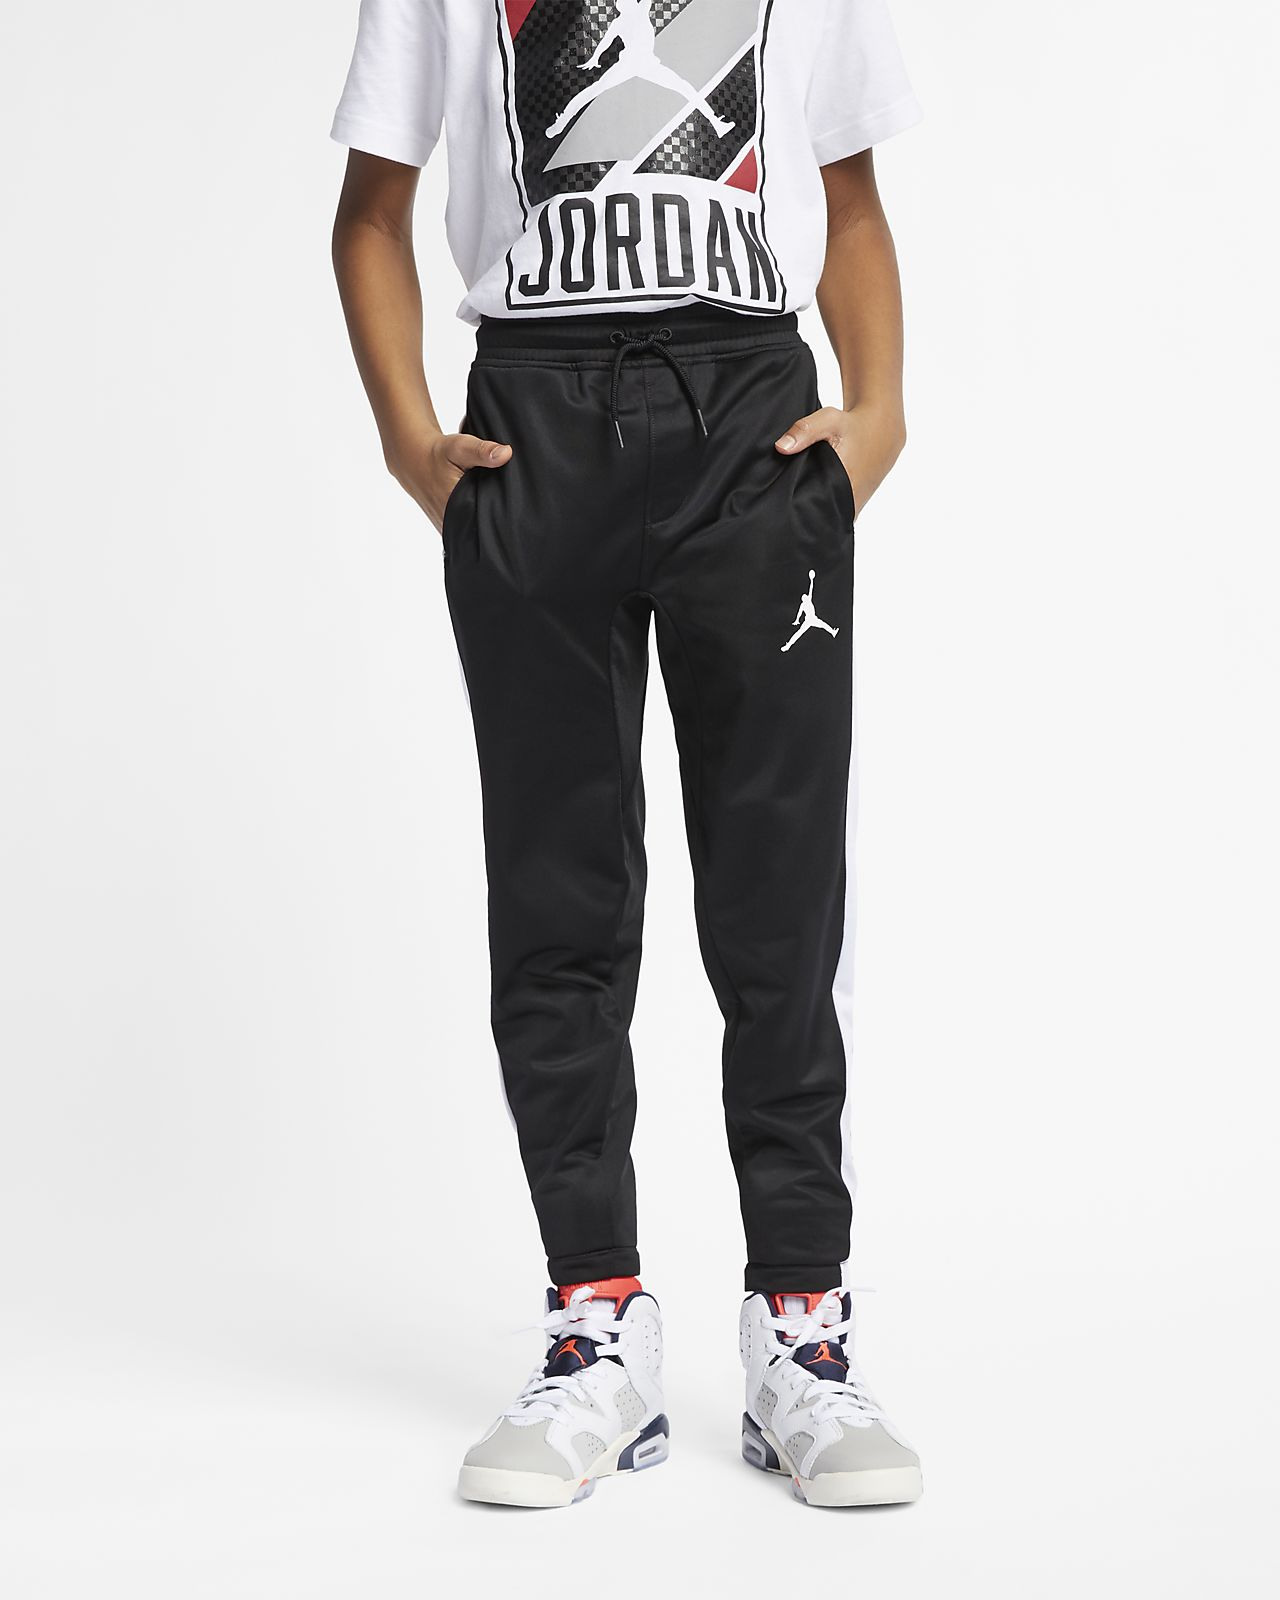 Calças Jordan Sportswear Diamond Júnior (Rapaz)